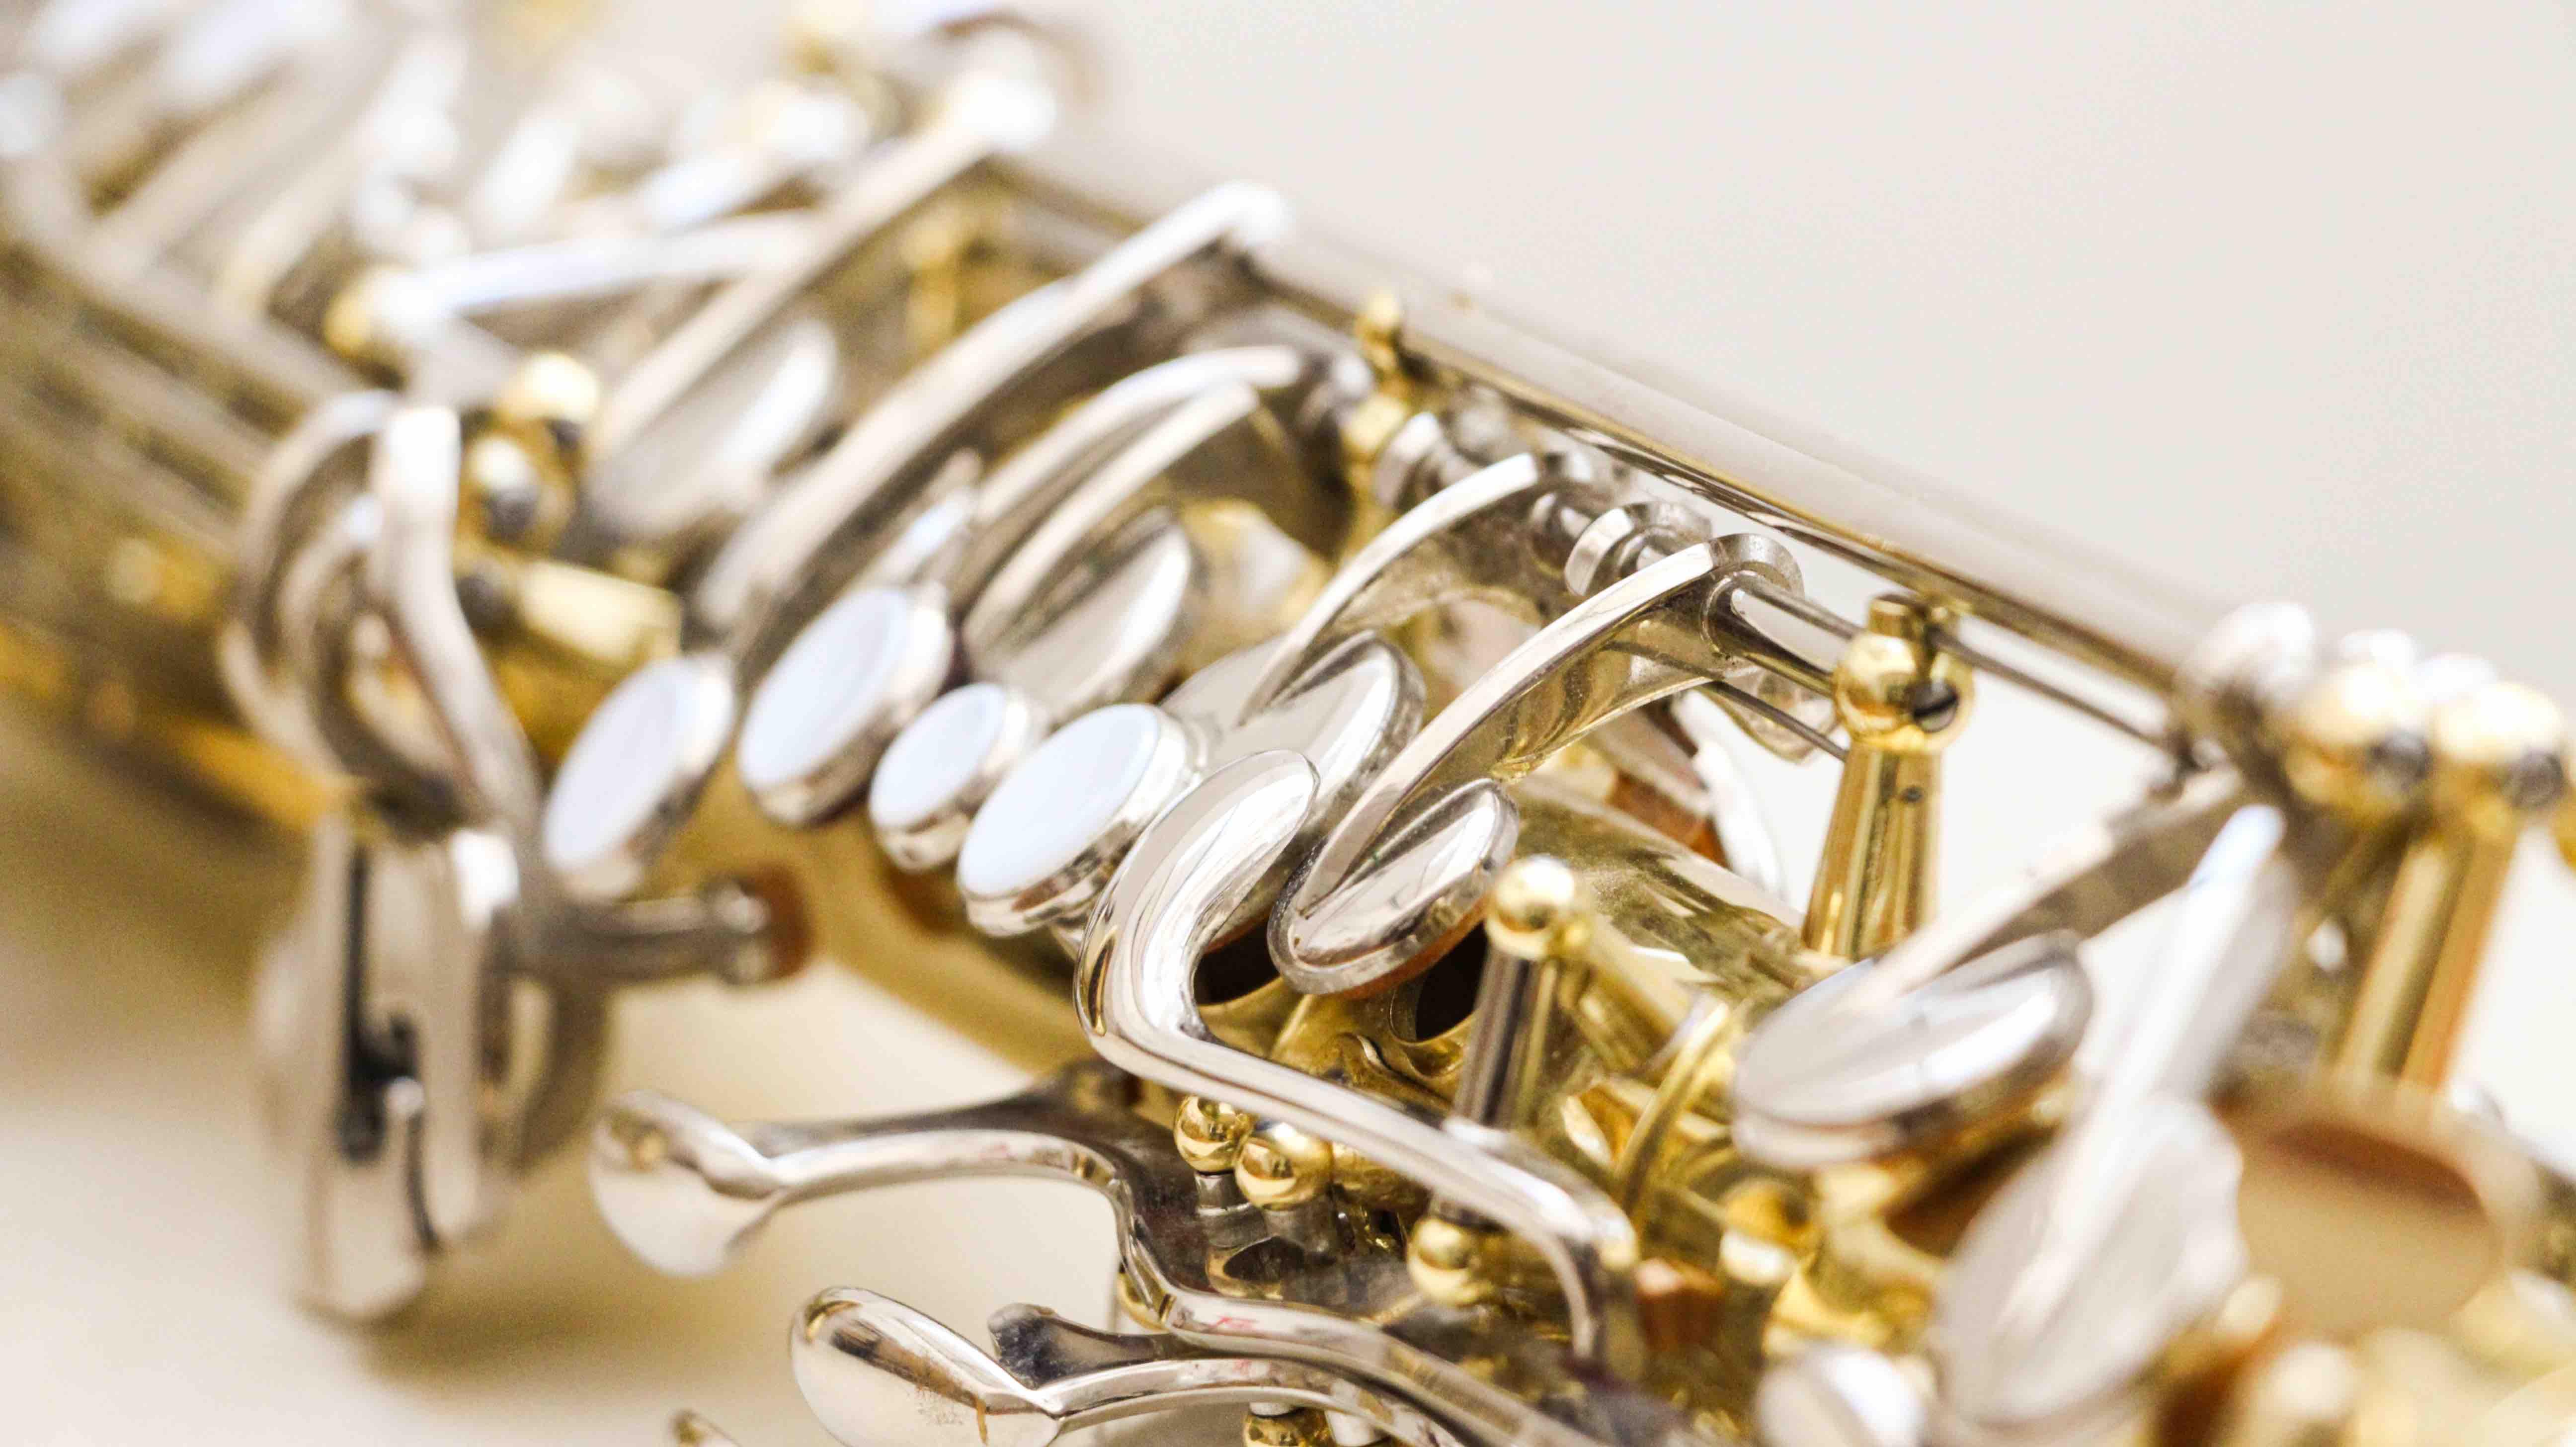 The saxophone maintenance